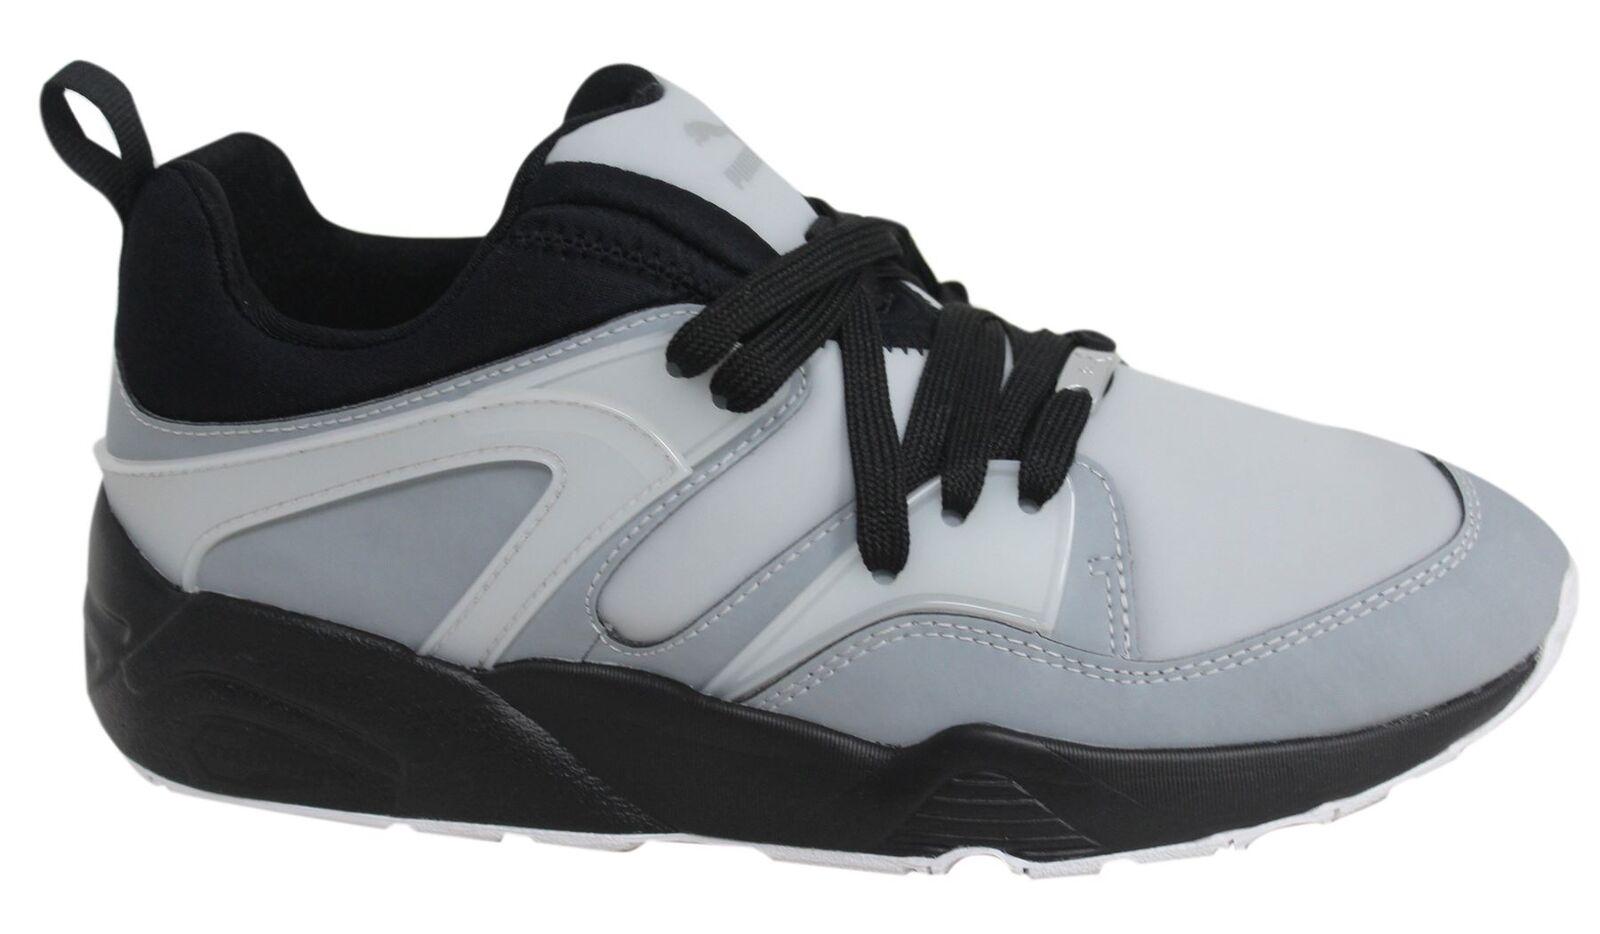 Puma Blaze of Glory Techy Lace Up noir  Gris  homme Trainers 361447 01 U21